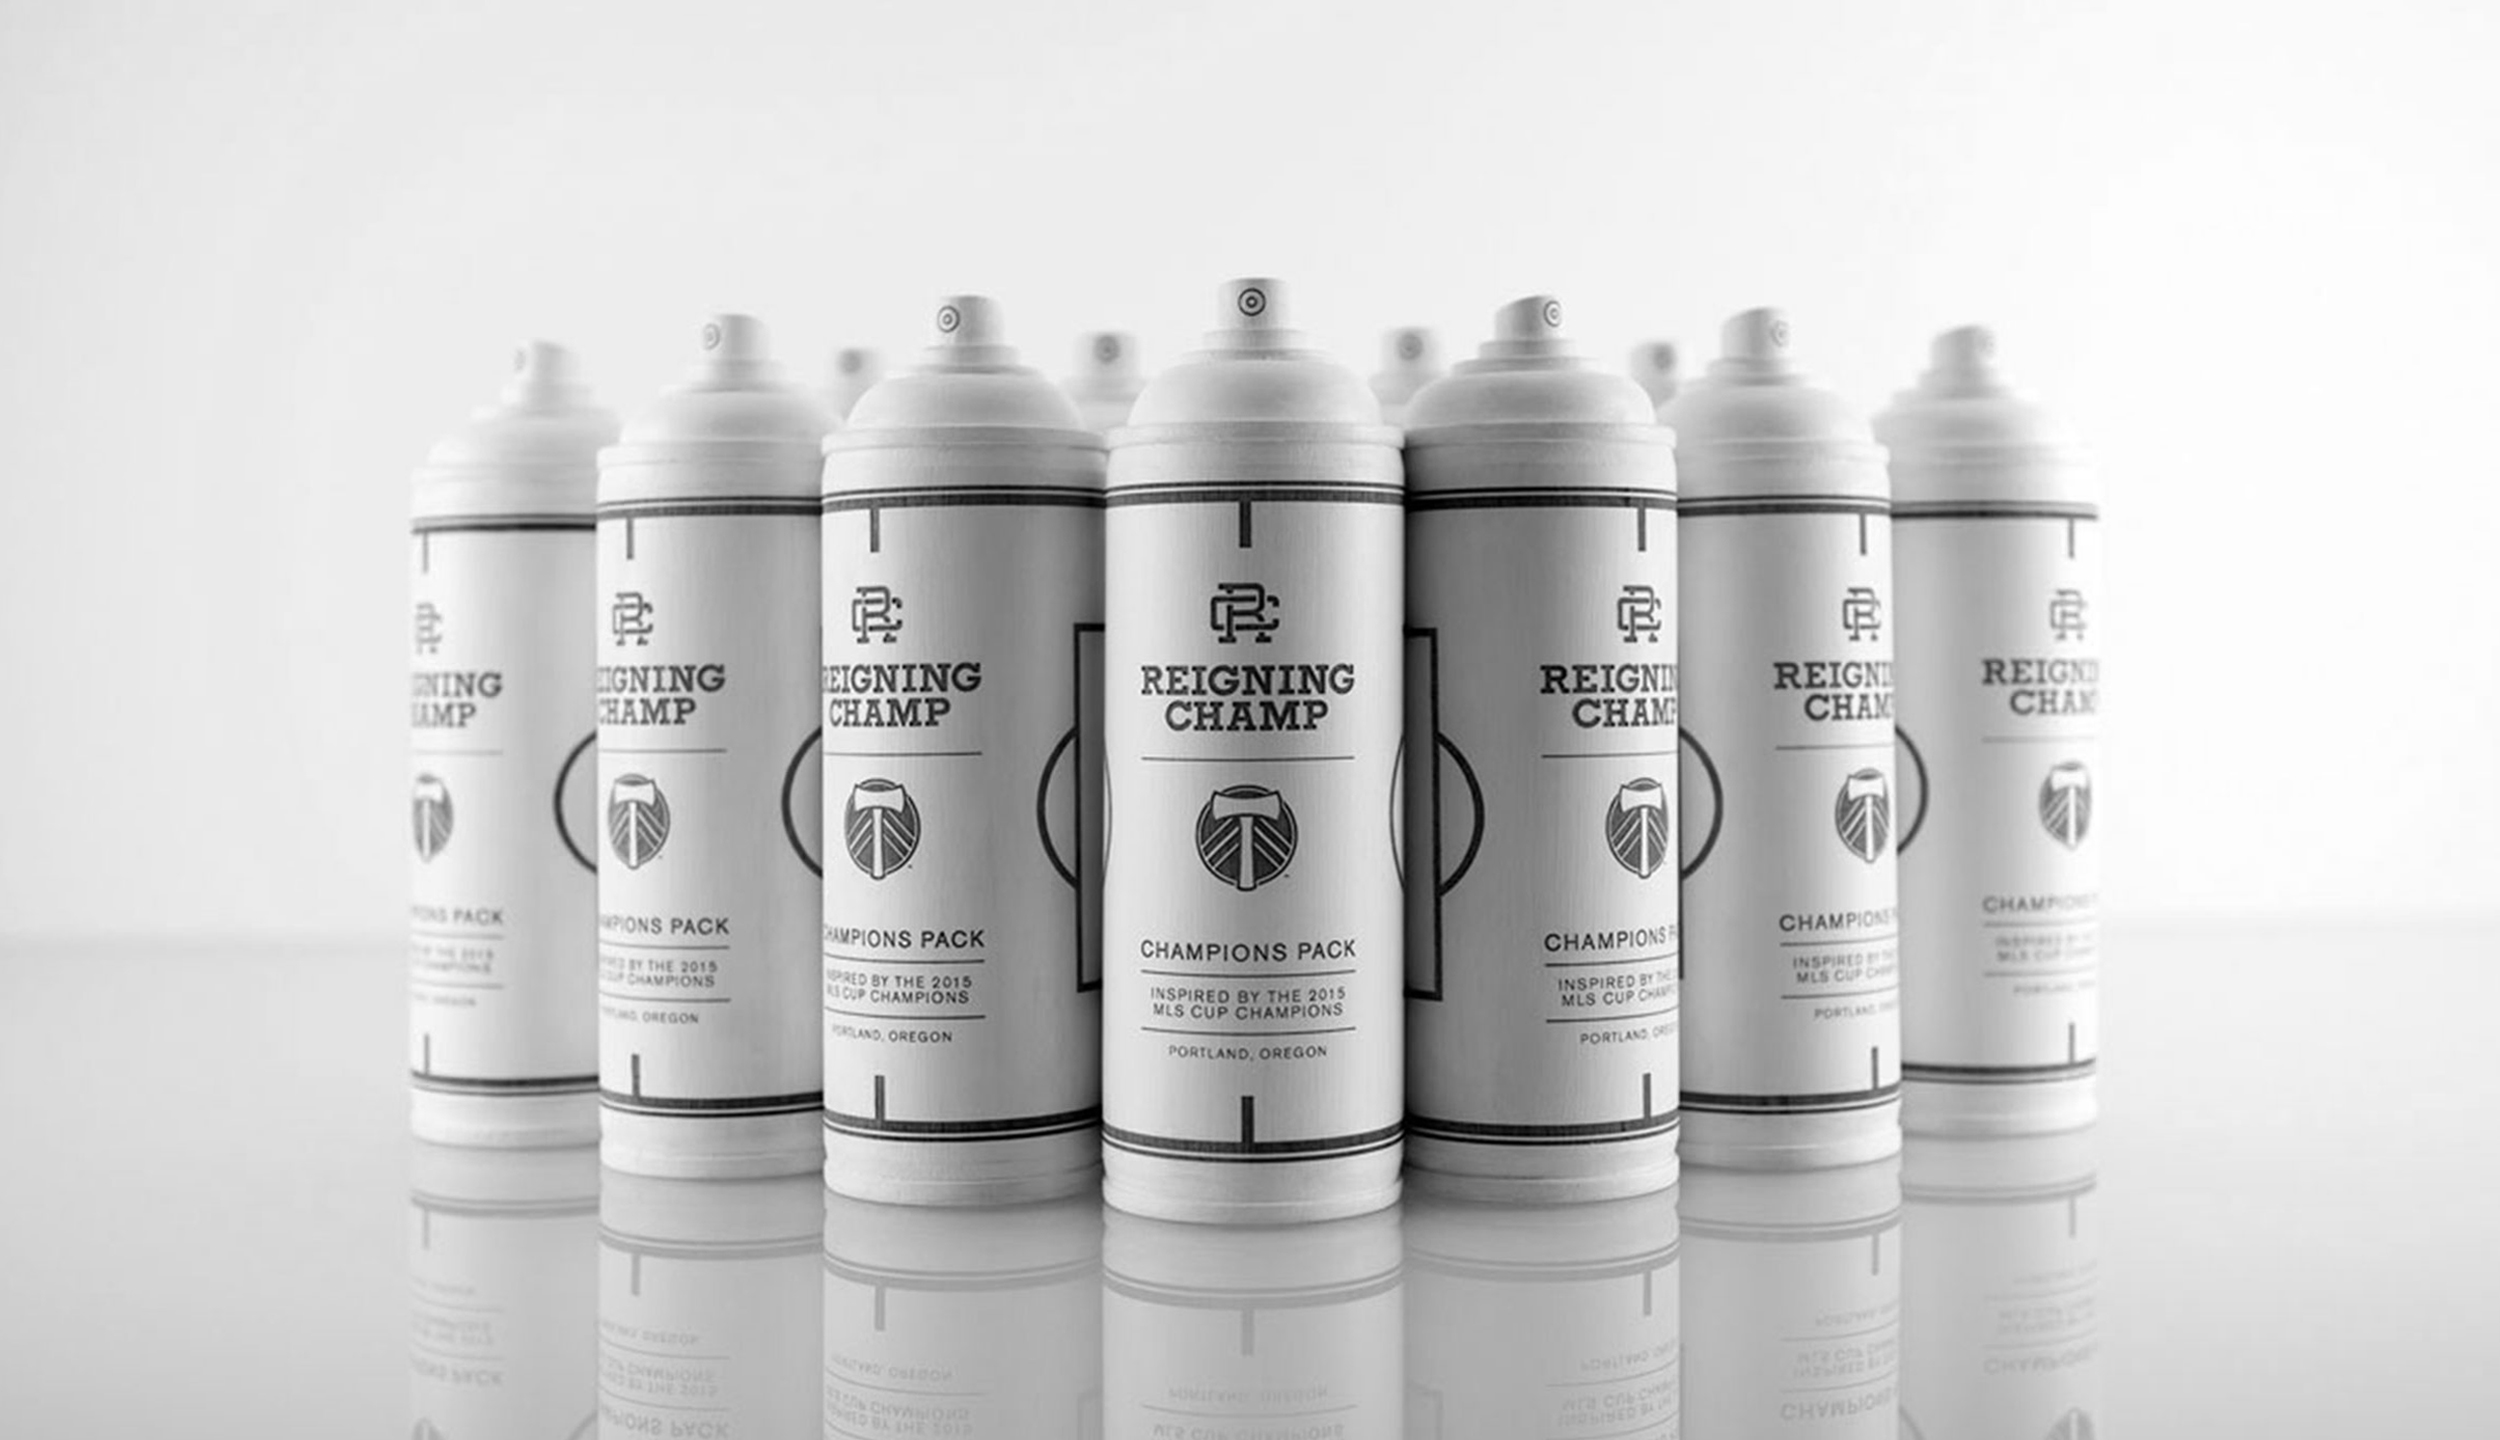 AntonioBrasko-ReigningChamp-PortlandTimbers-ChampionsPack-MLS-Soccer-SprayPaint-Art-Design-Graffiti 1.jpg